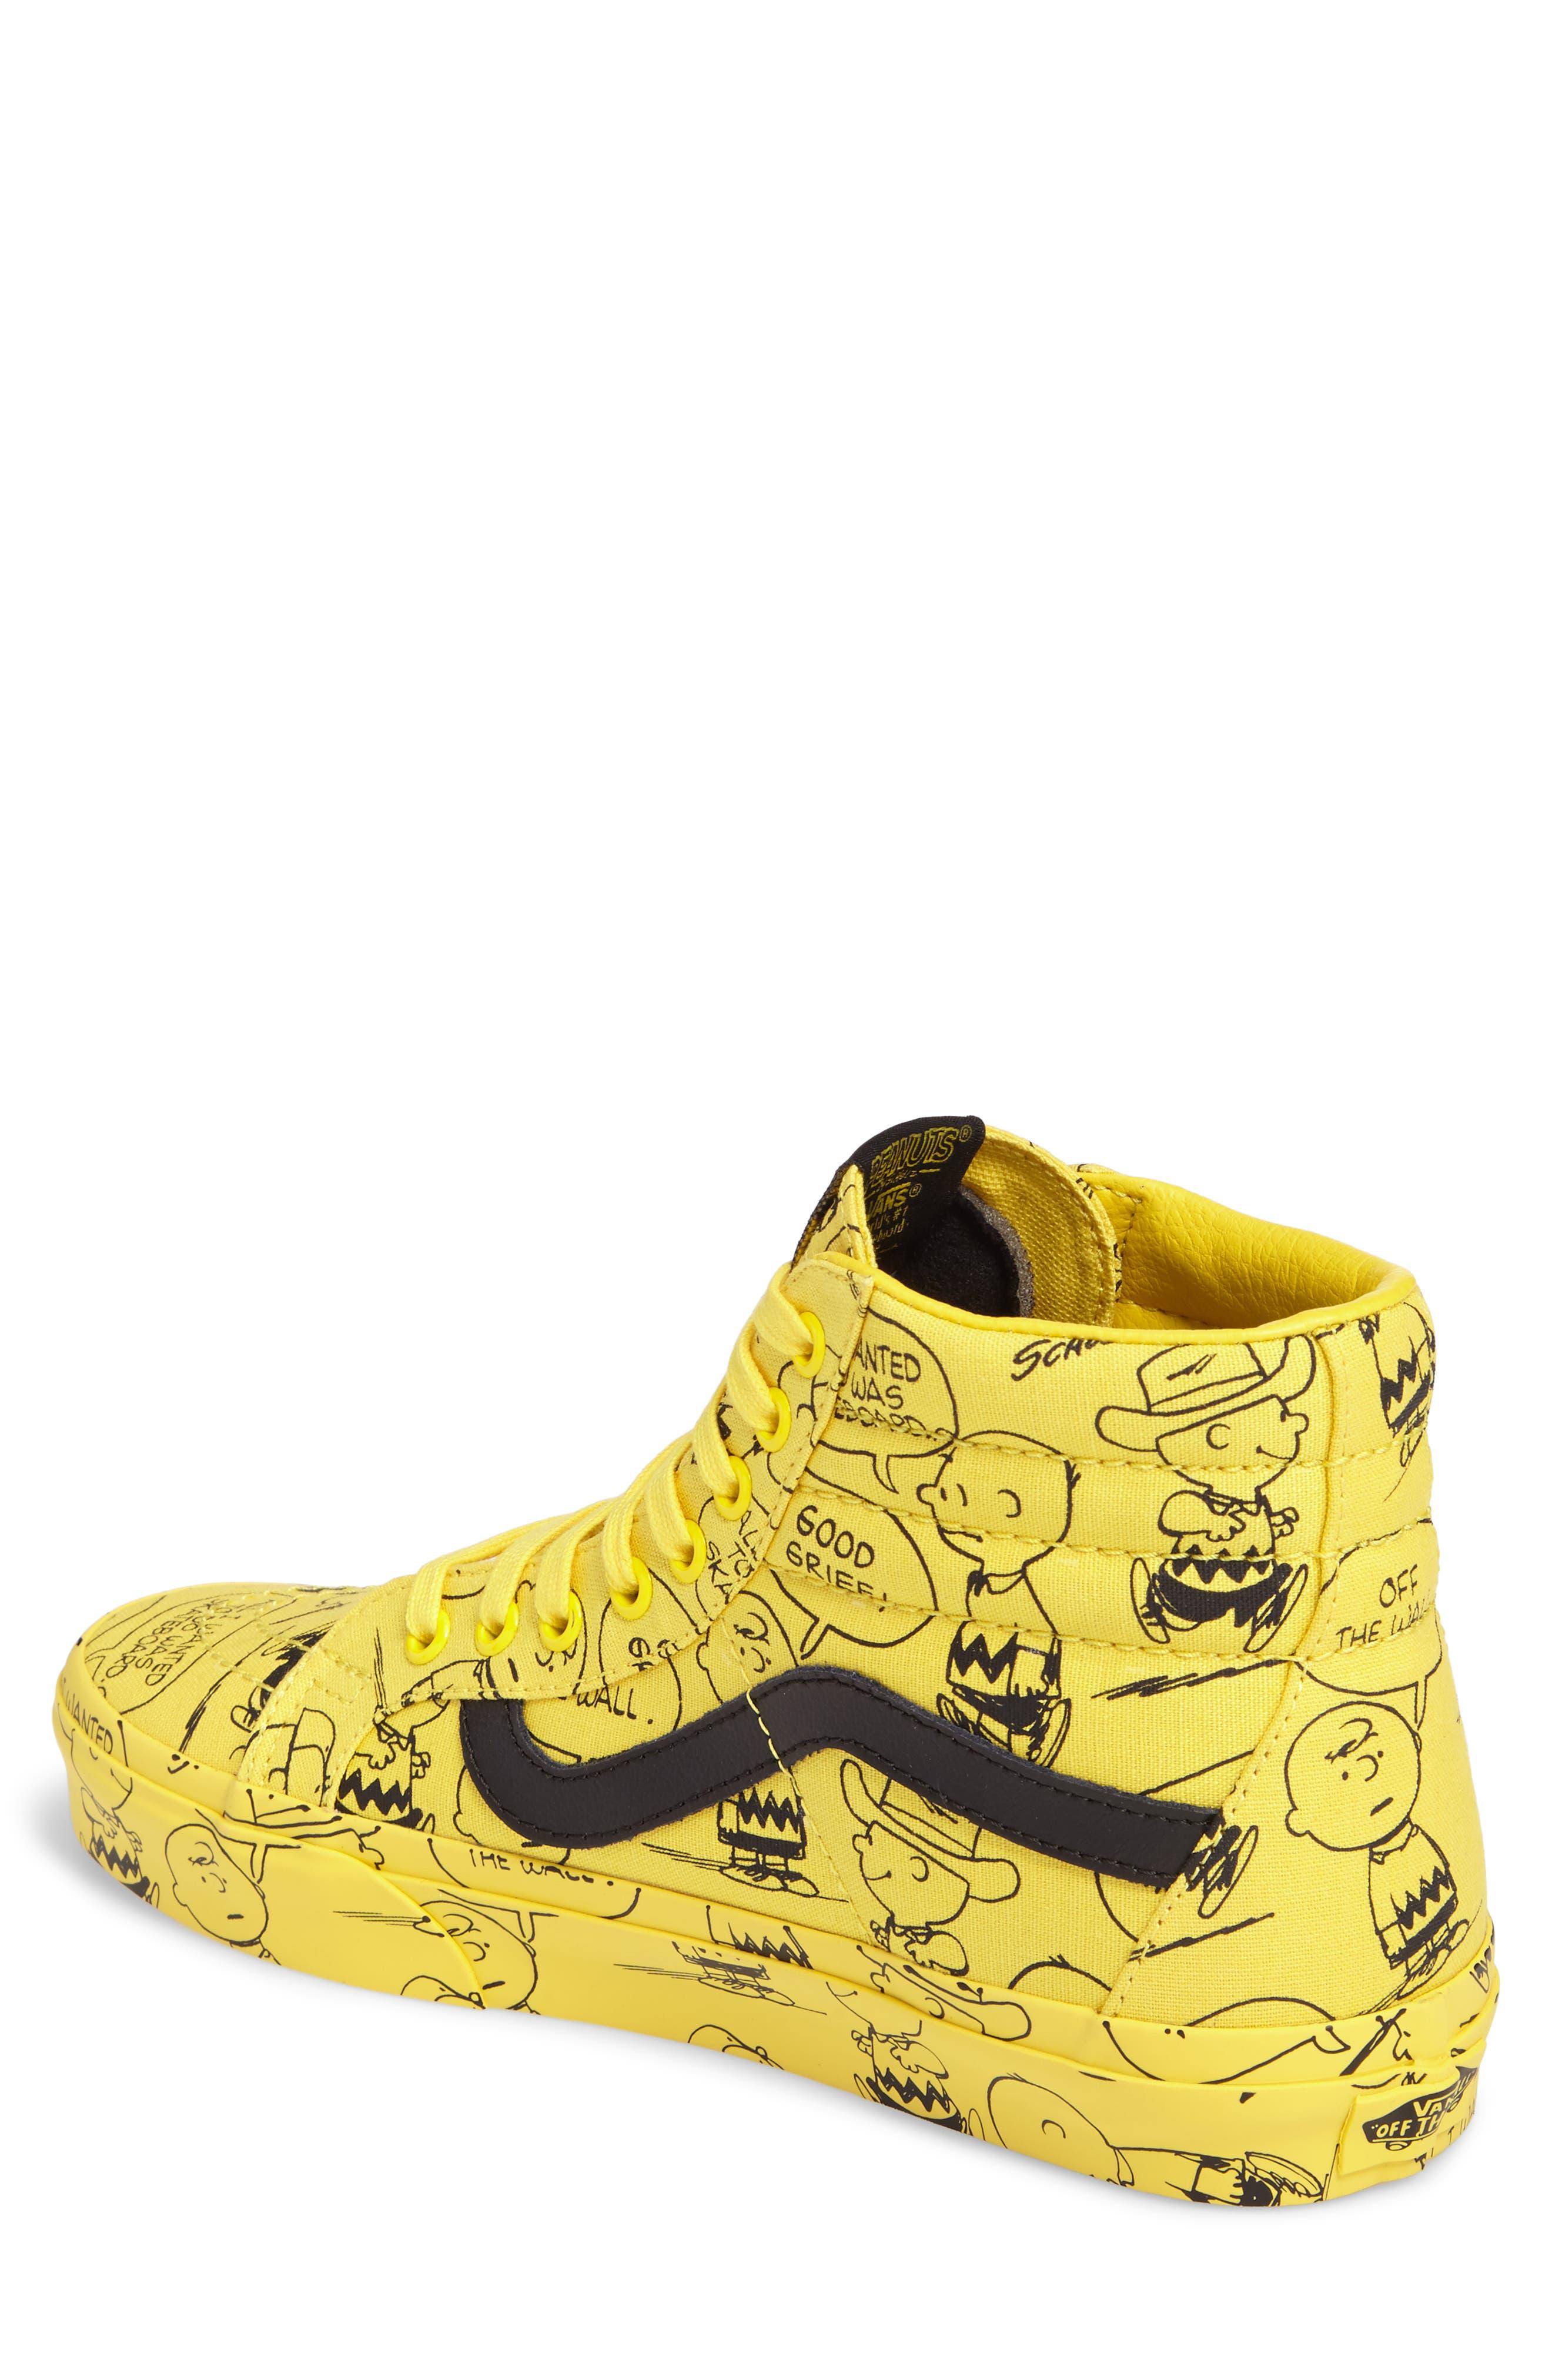 x Peanuts<sup>®</sup> Sk8-Hi Reissue Sneaker,                             Alternate thumbnail 2, color,                             760